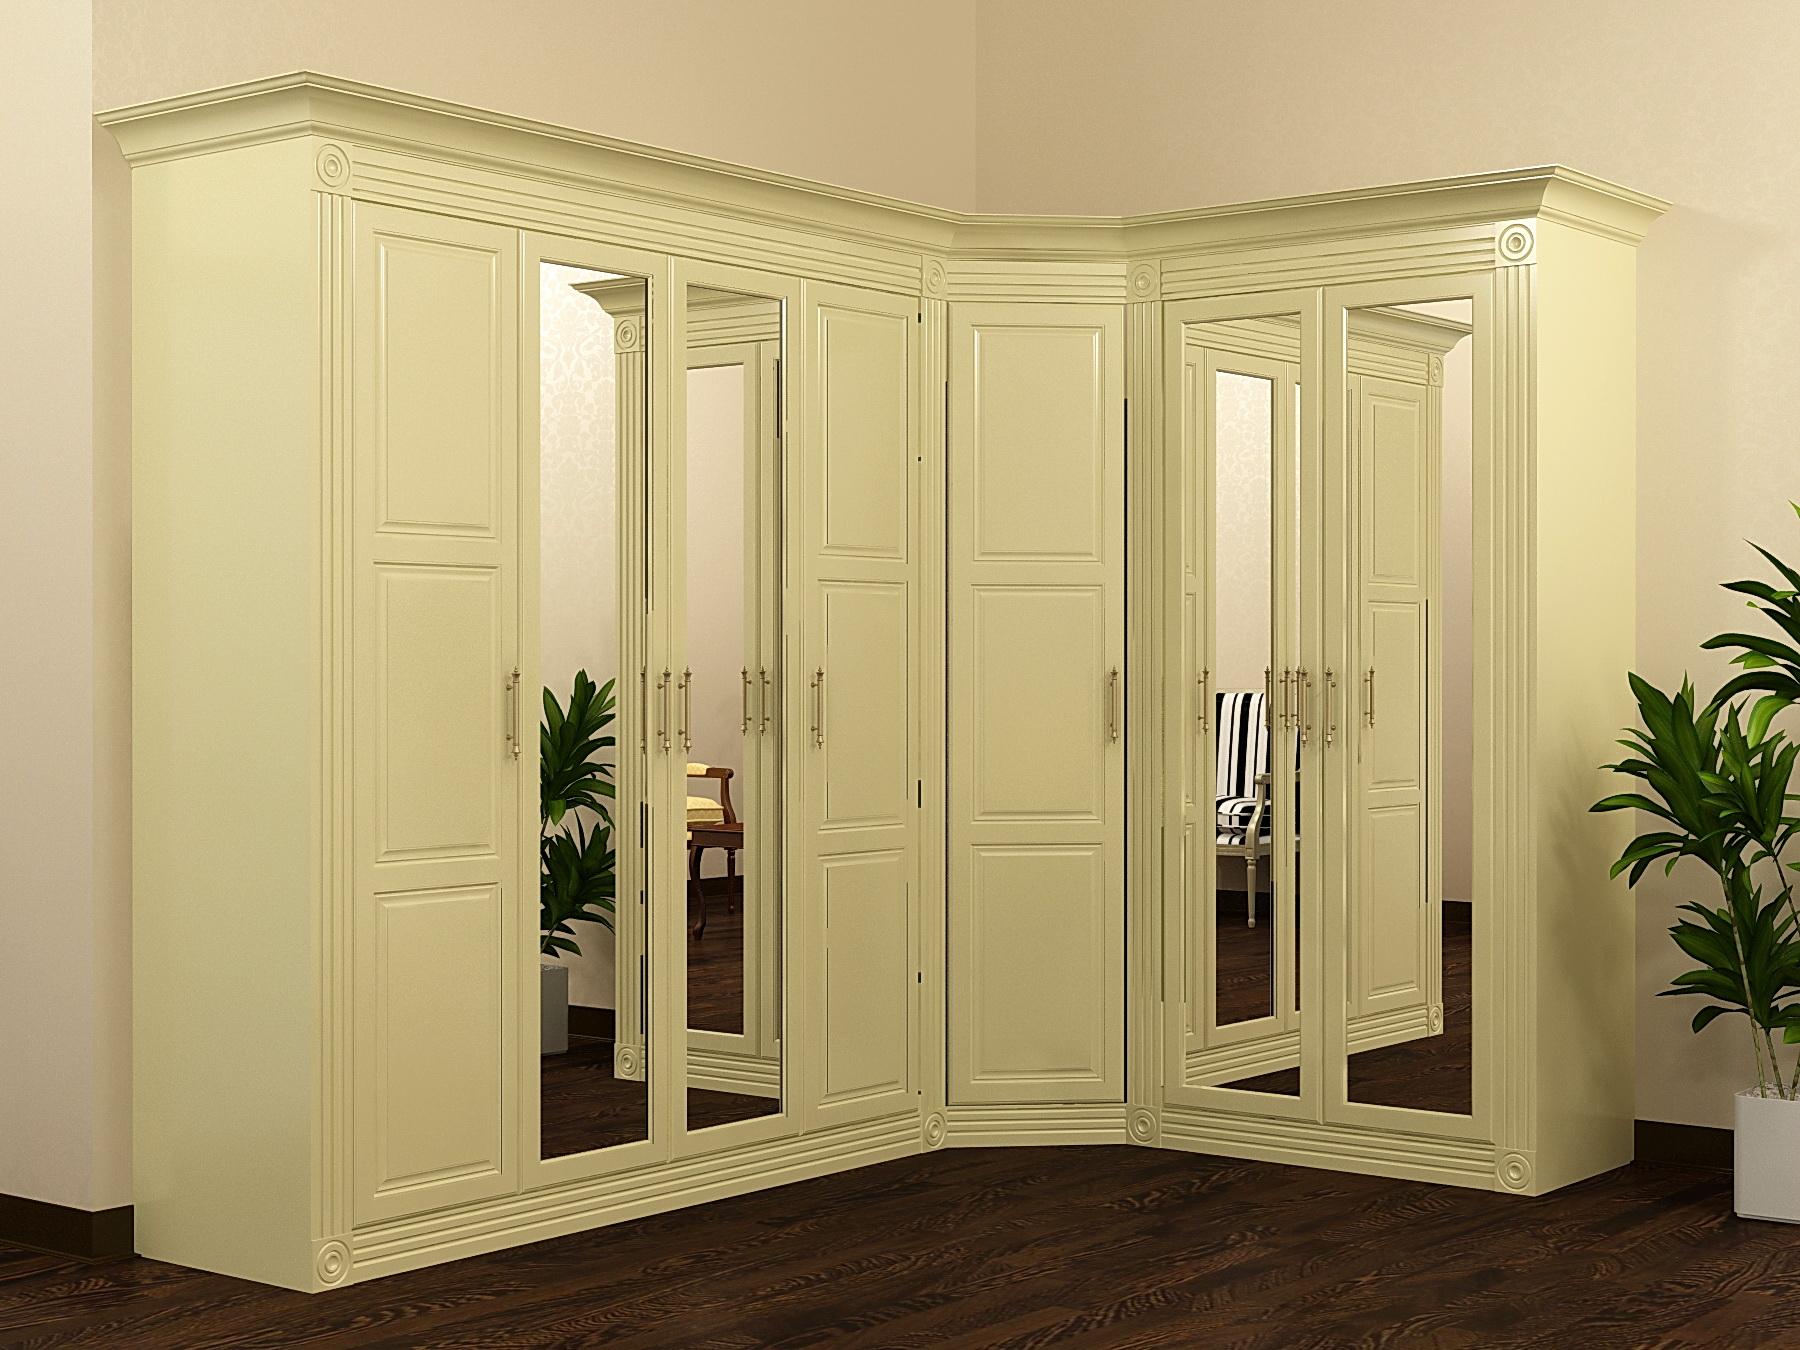 Классические шкафы-купе на заказ mebelbest61.ru - мебель на .